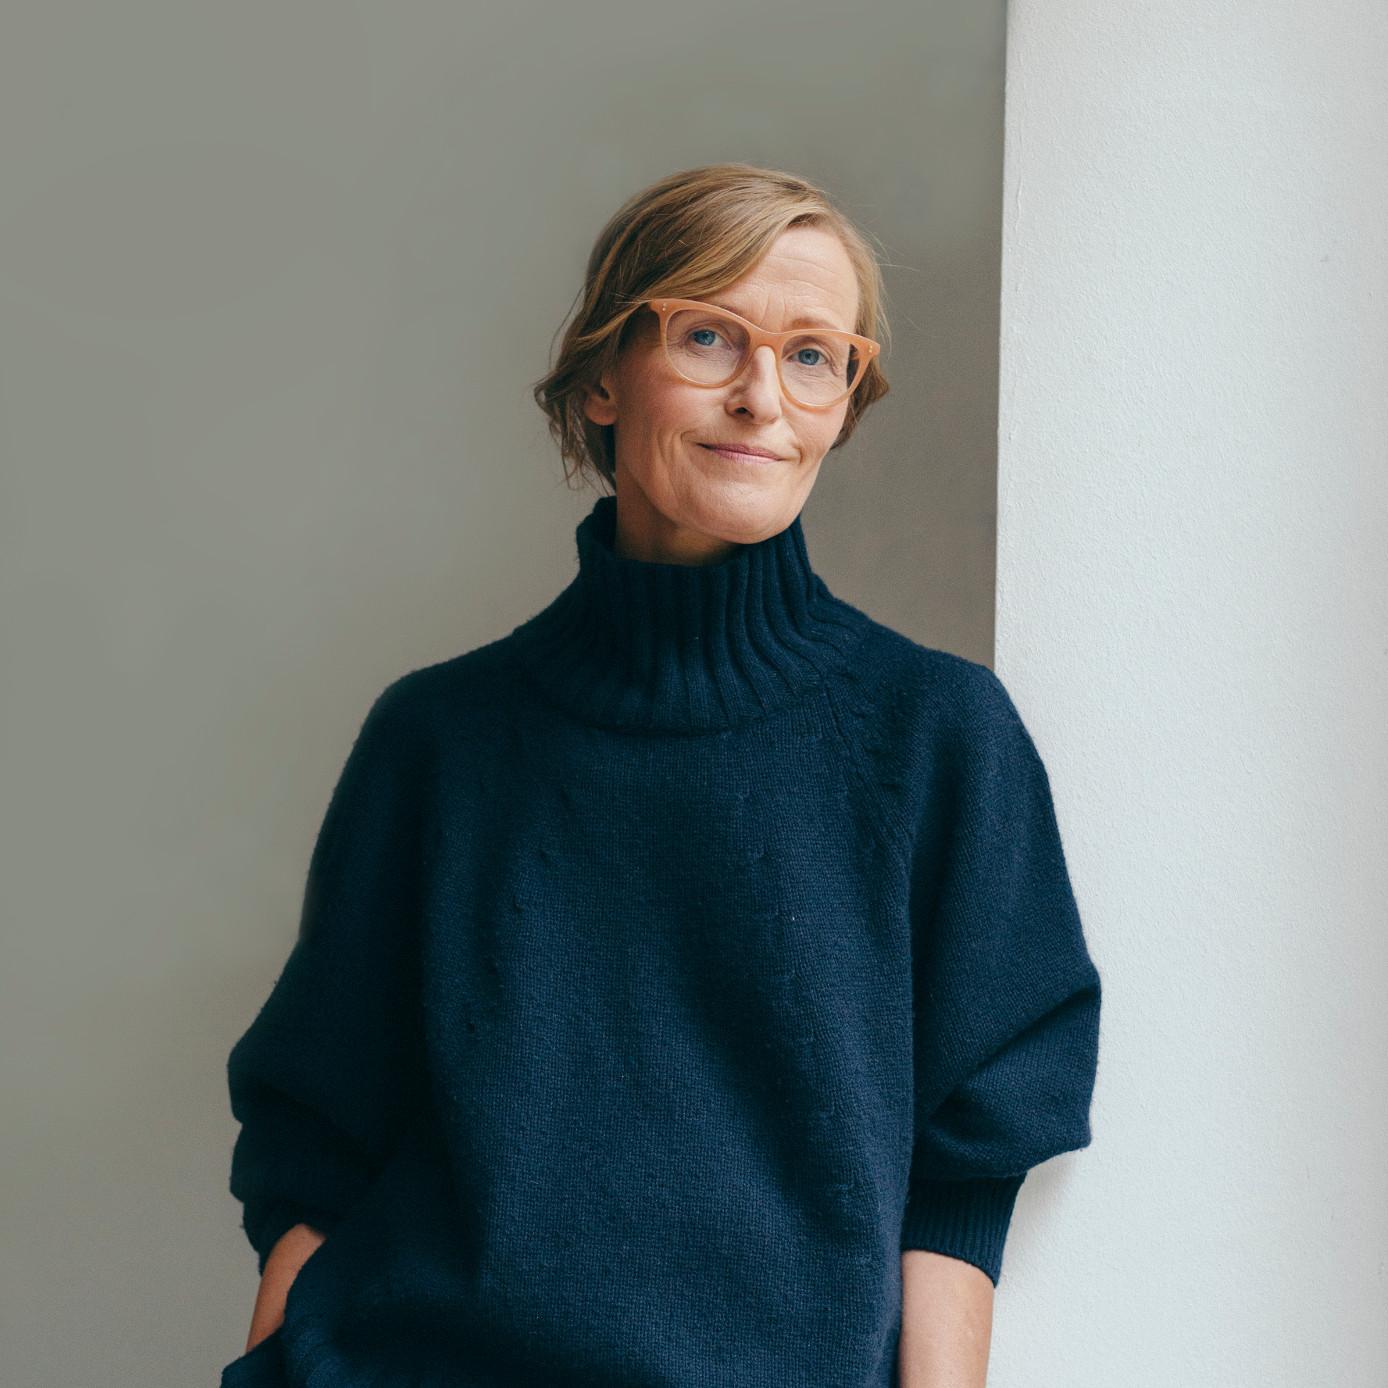 Marietta Piekenbrock